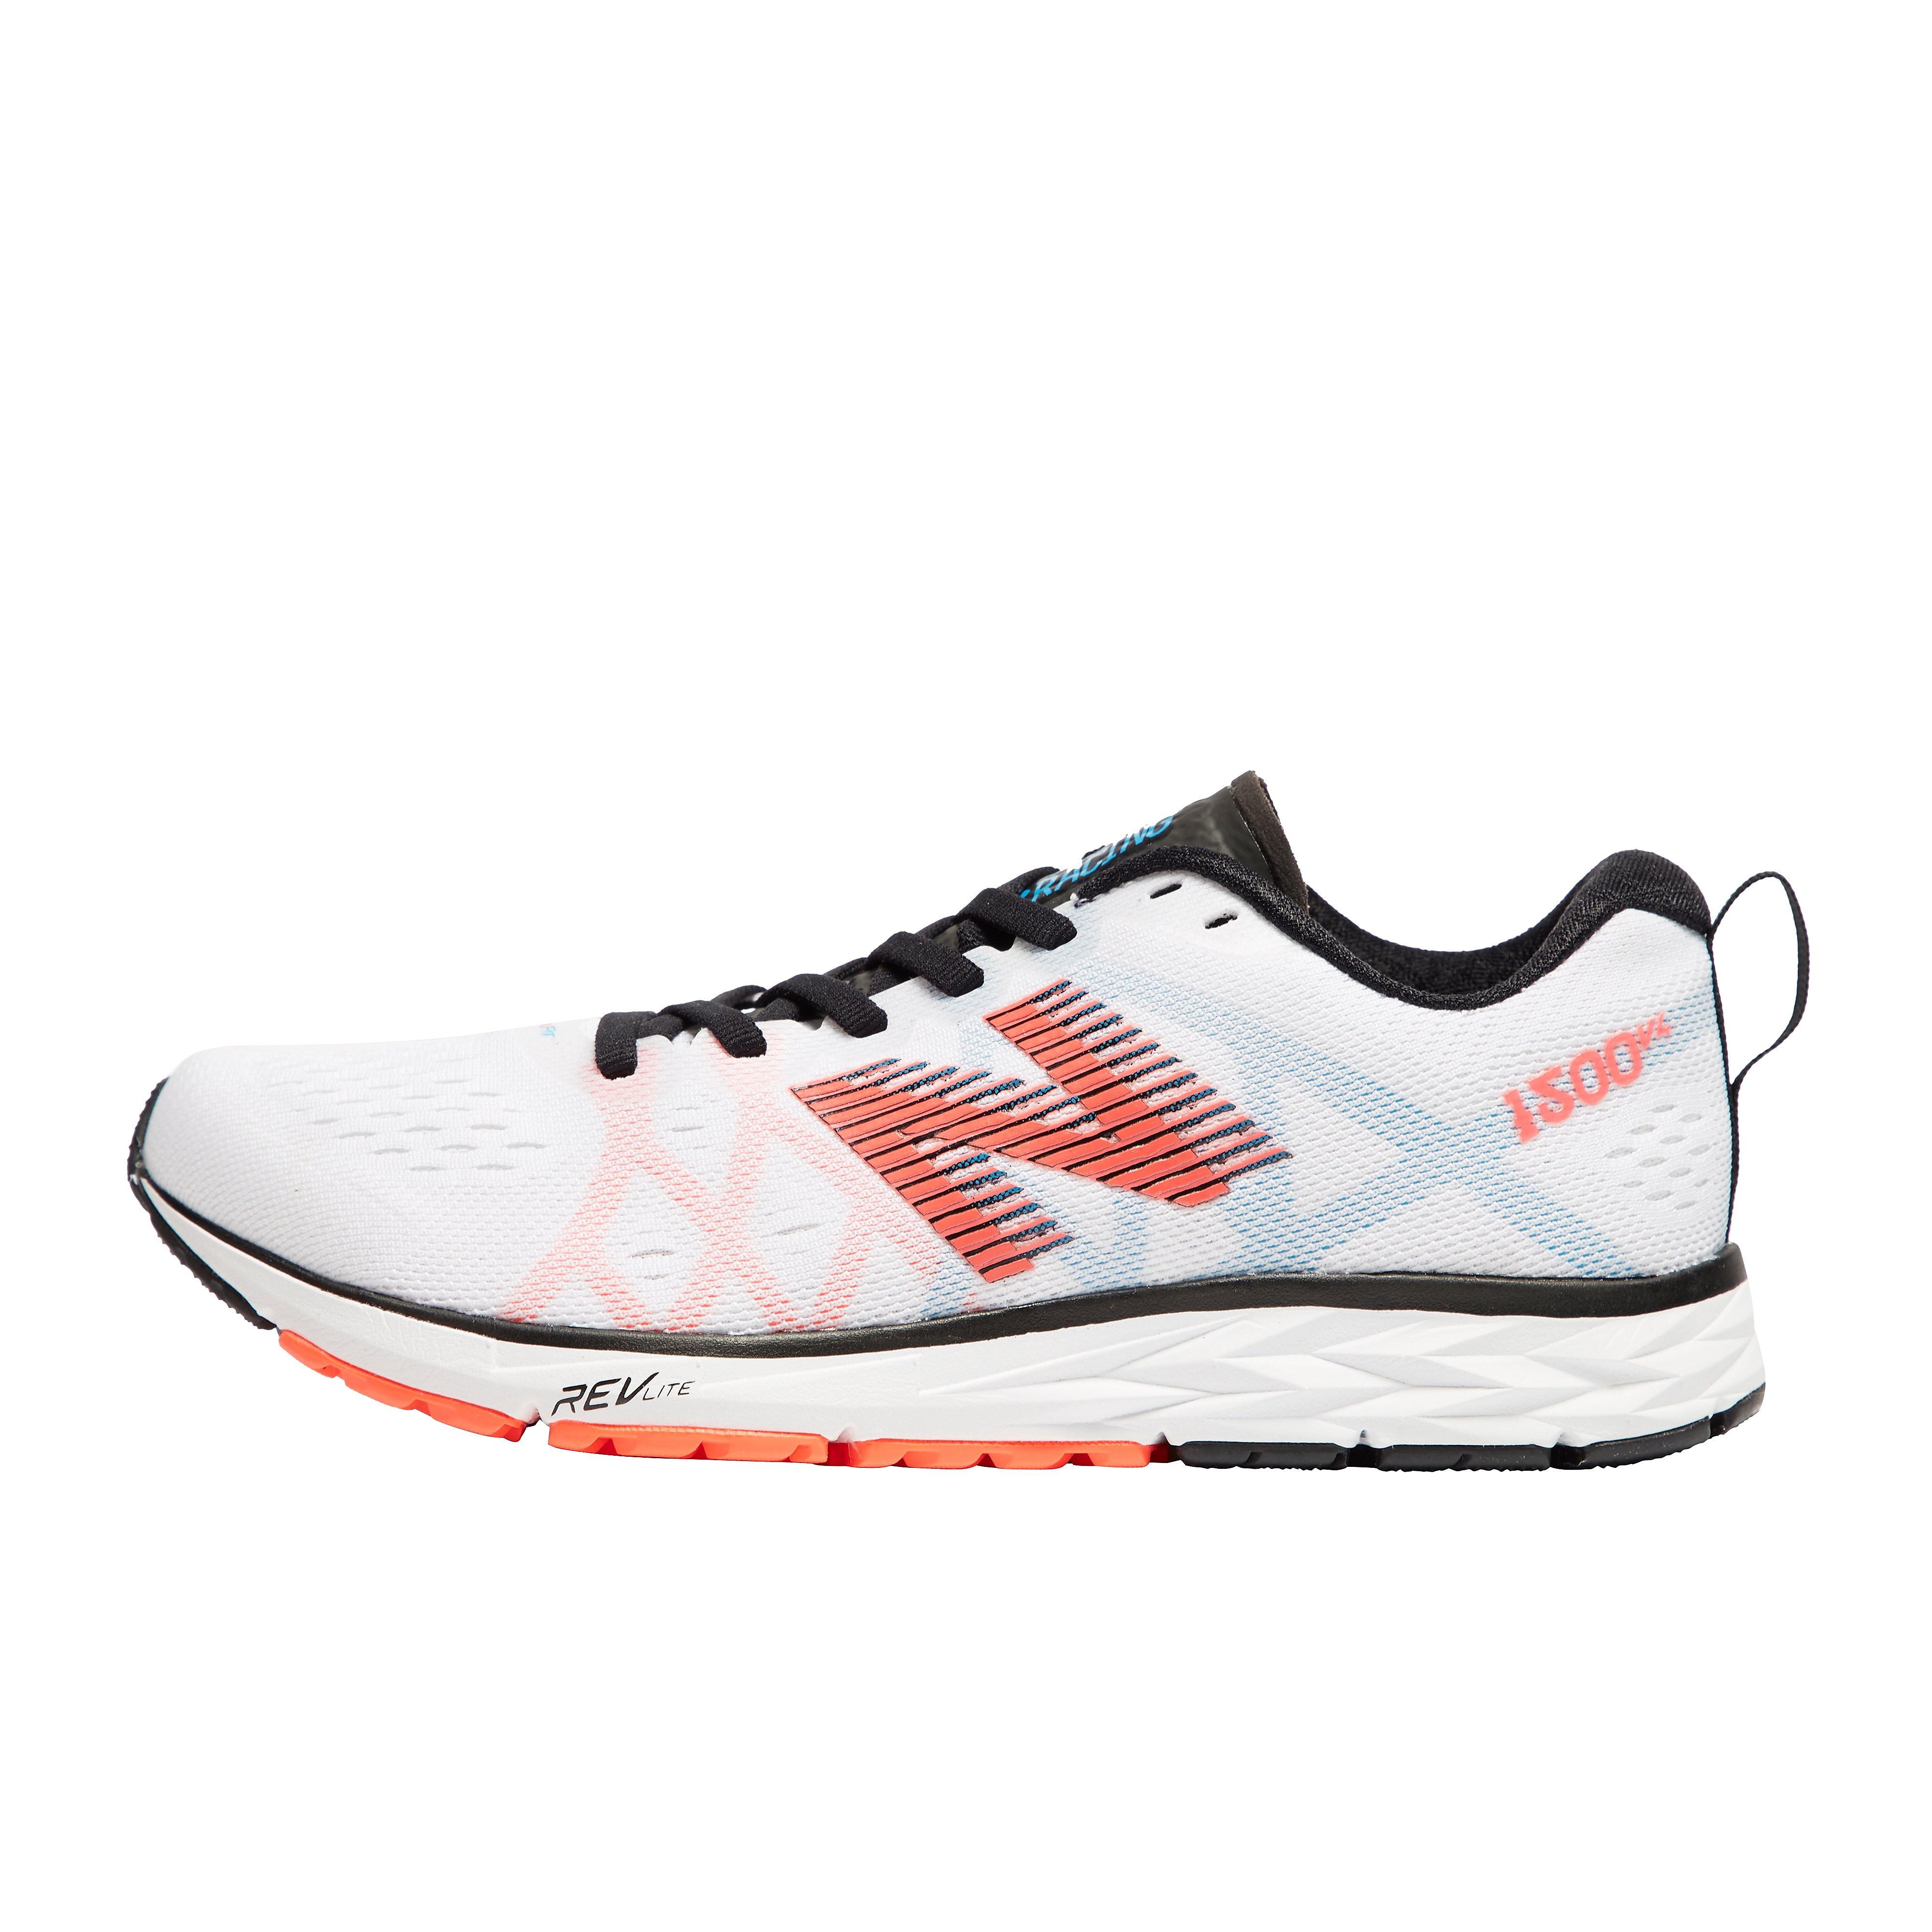 New Balance 1500v4 Women's Running Shoes